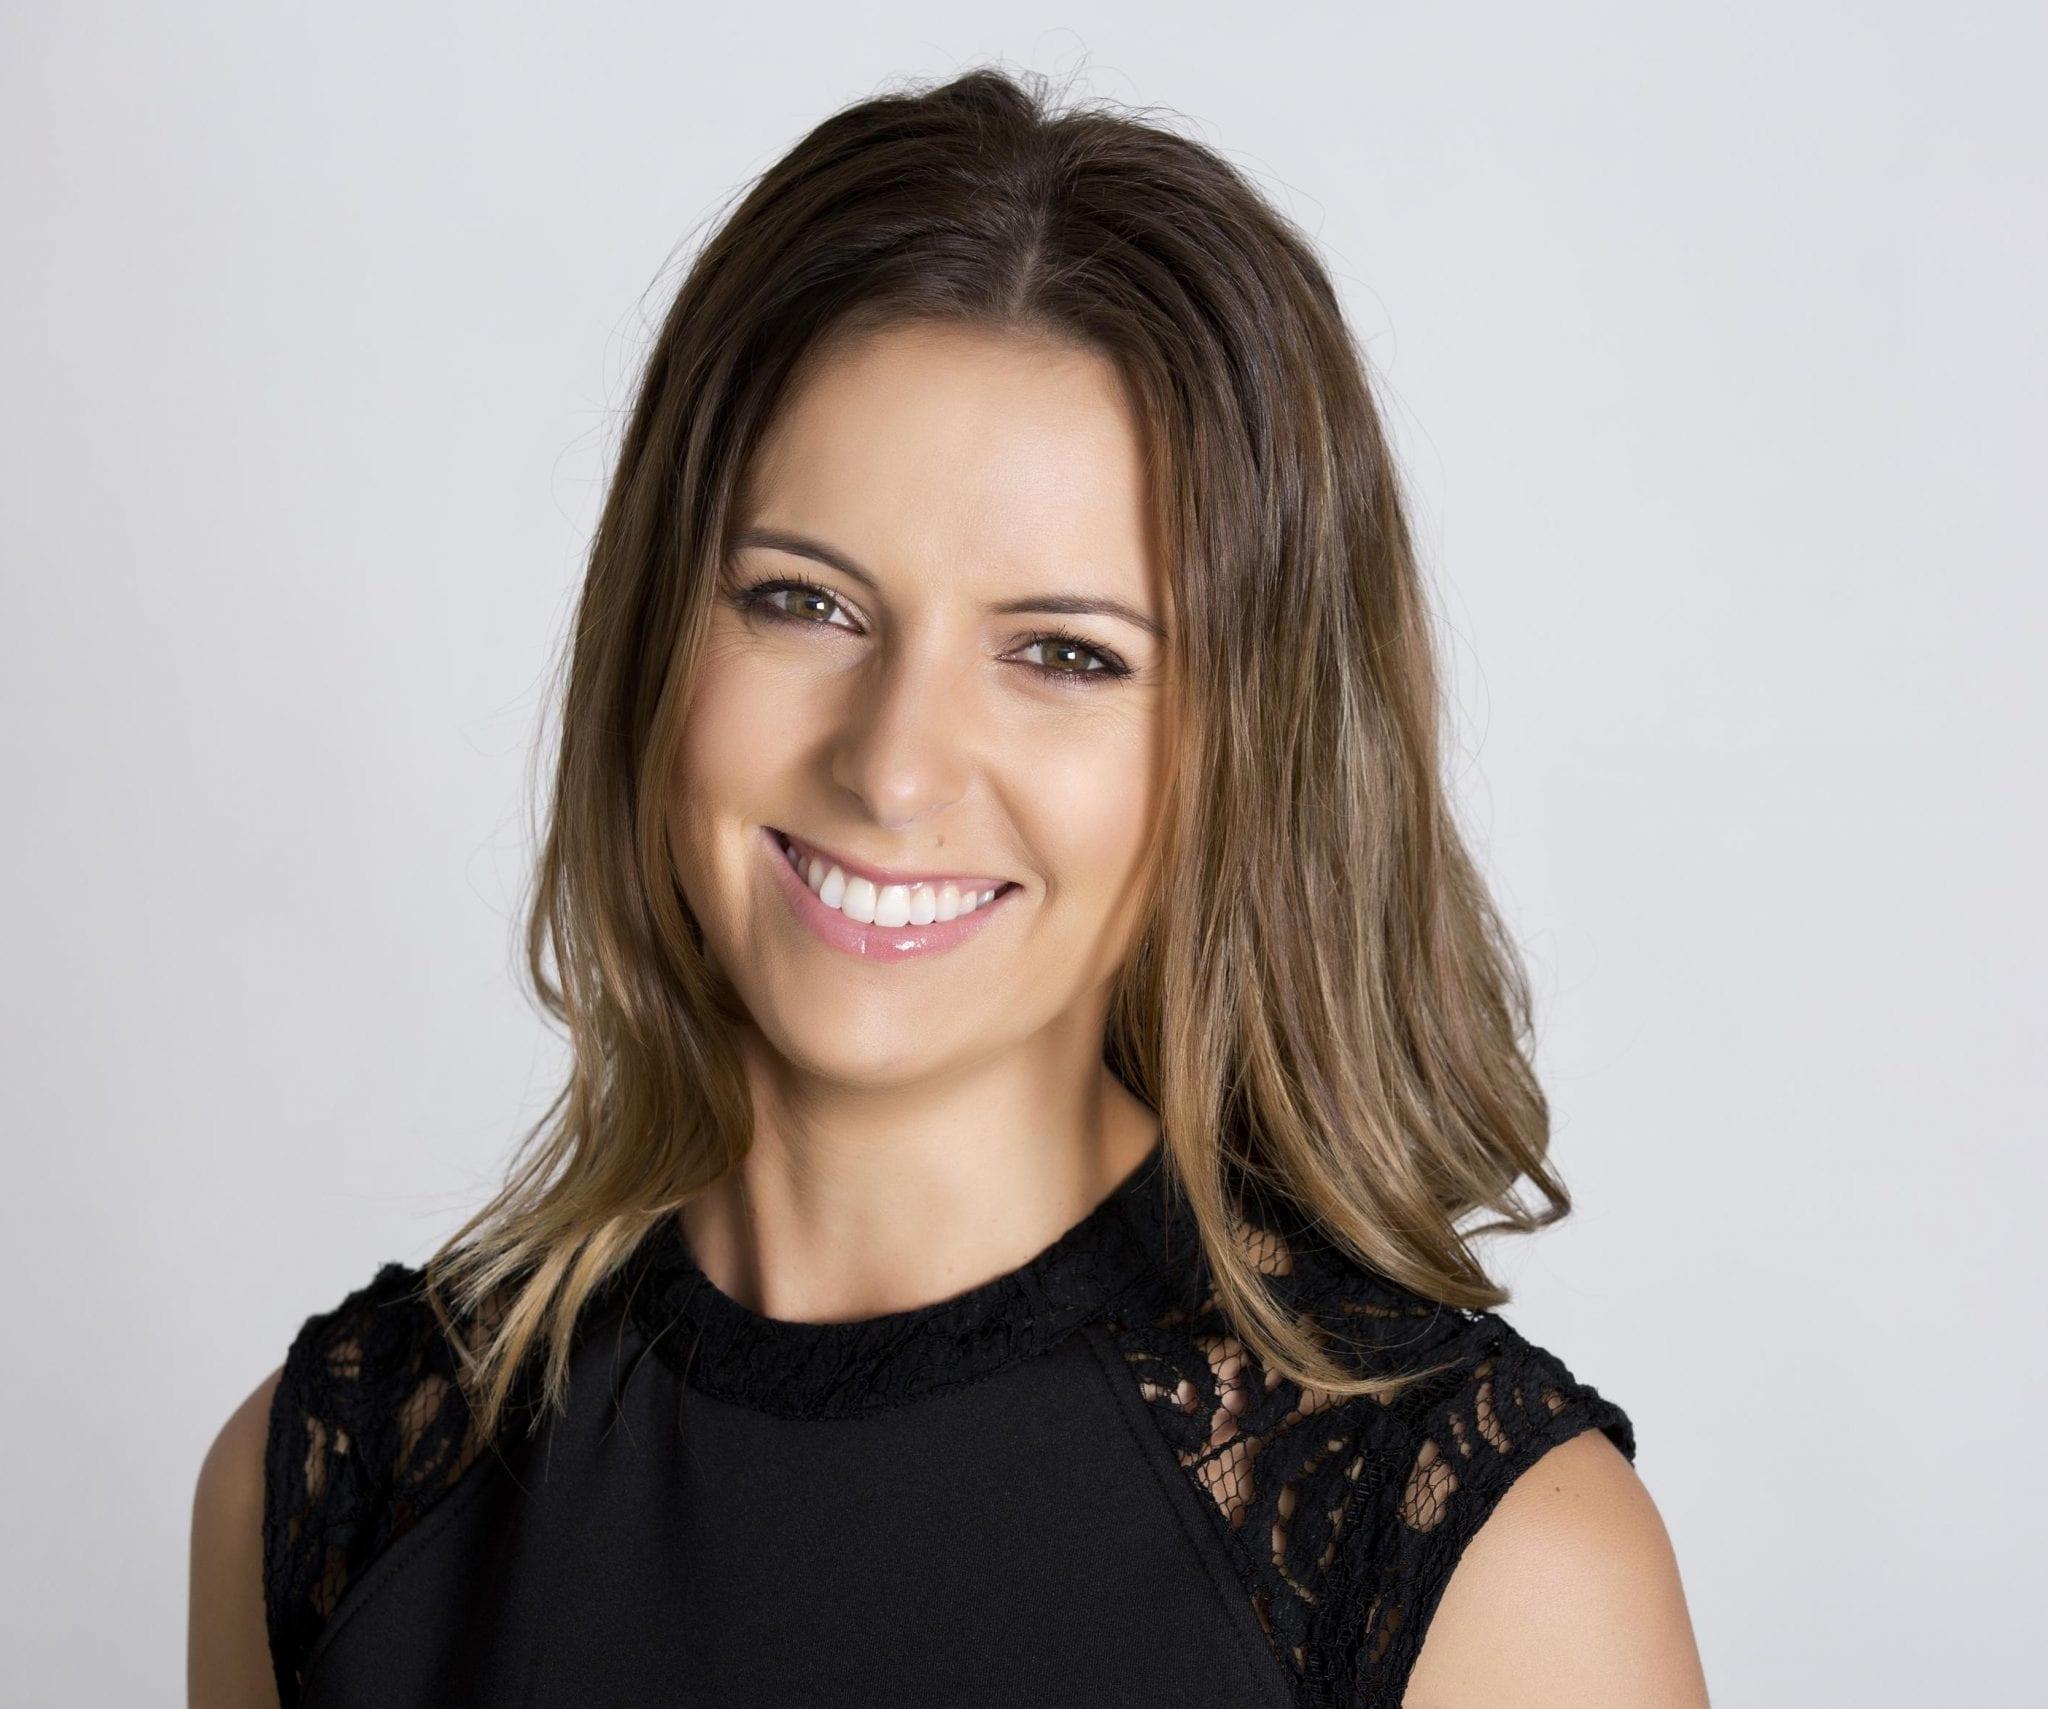 Award-Winning Bridal Hair & Makeup Artist Amanda Higl Hair Stylist Make-up Artist Gold Coast